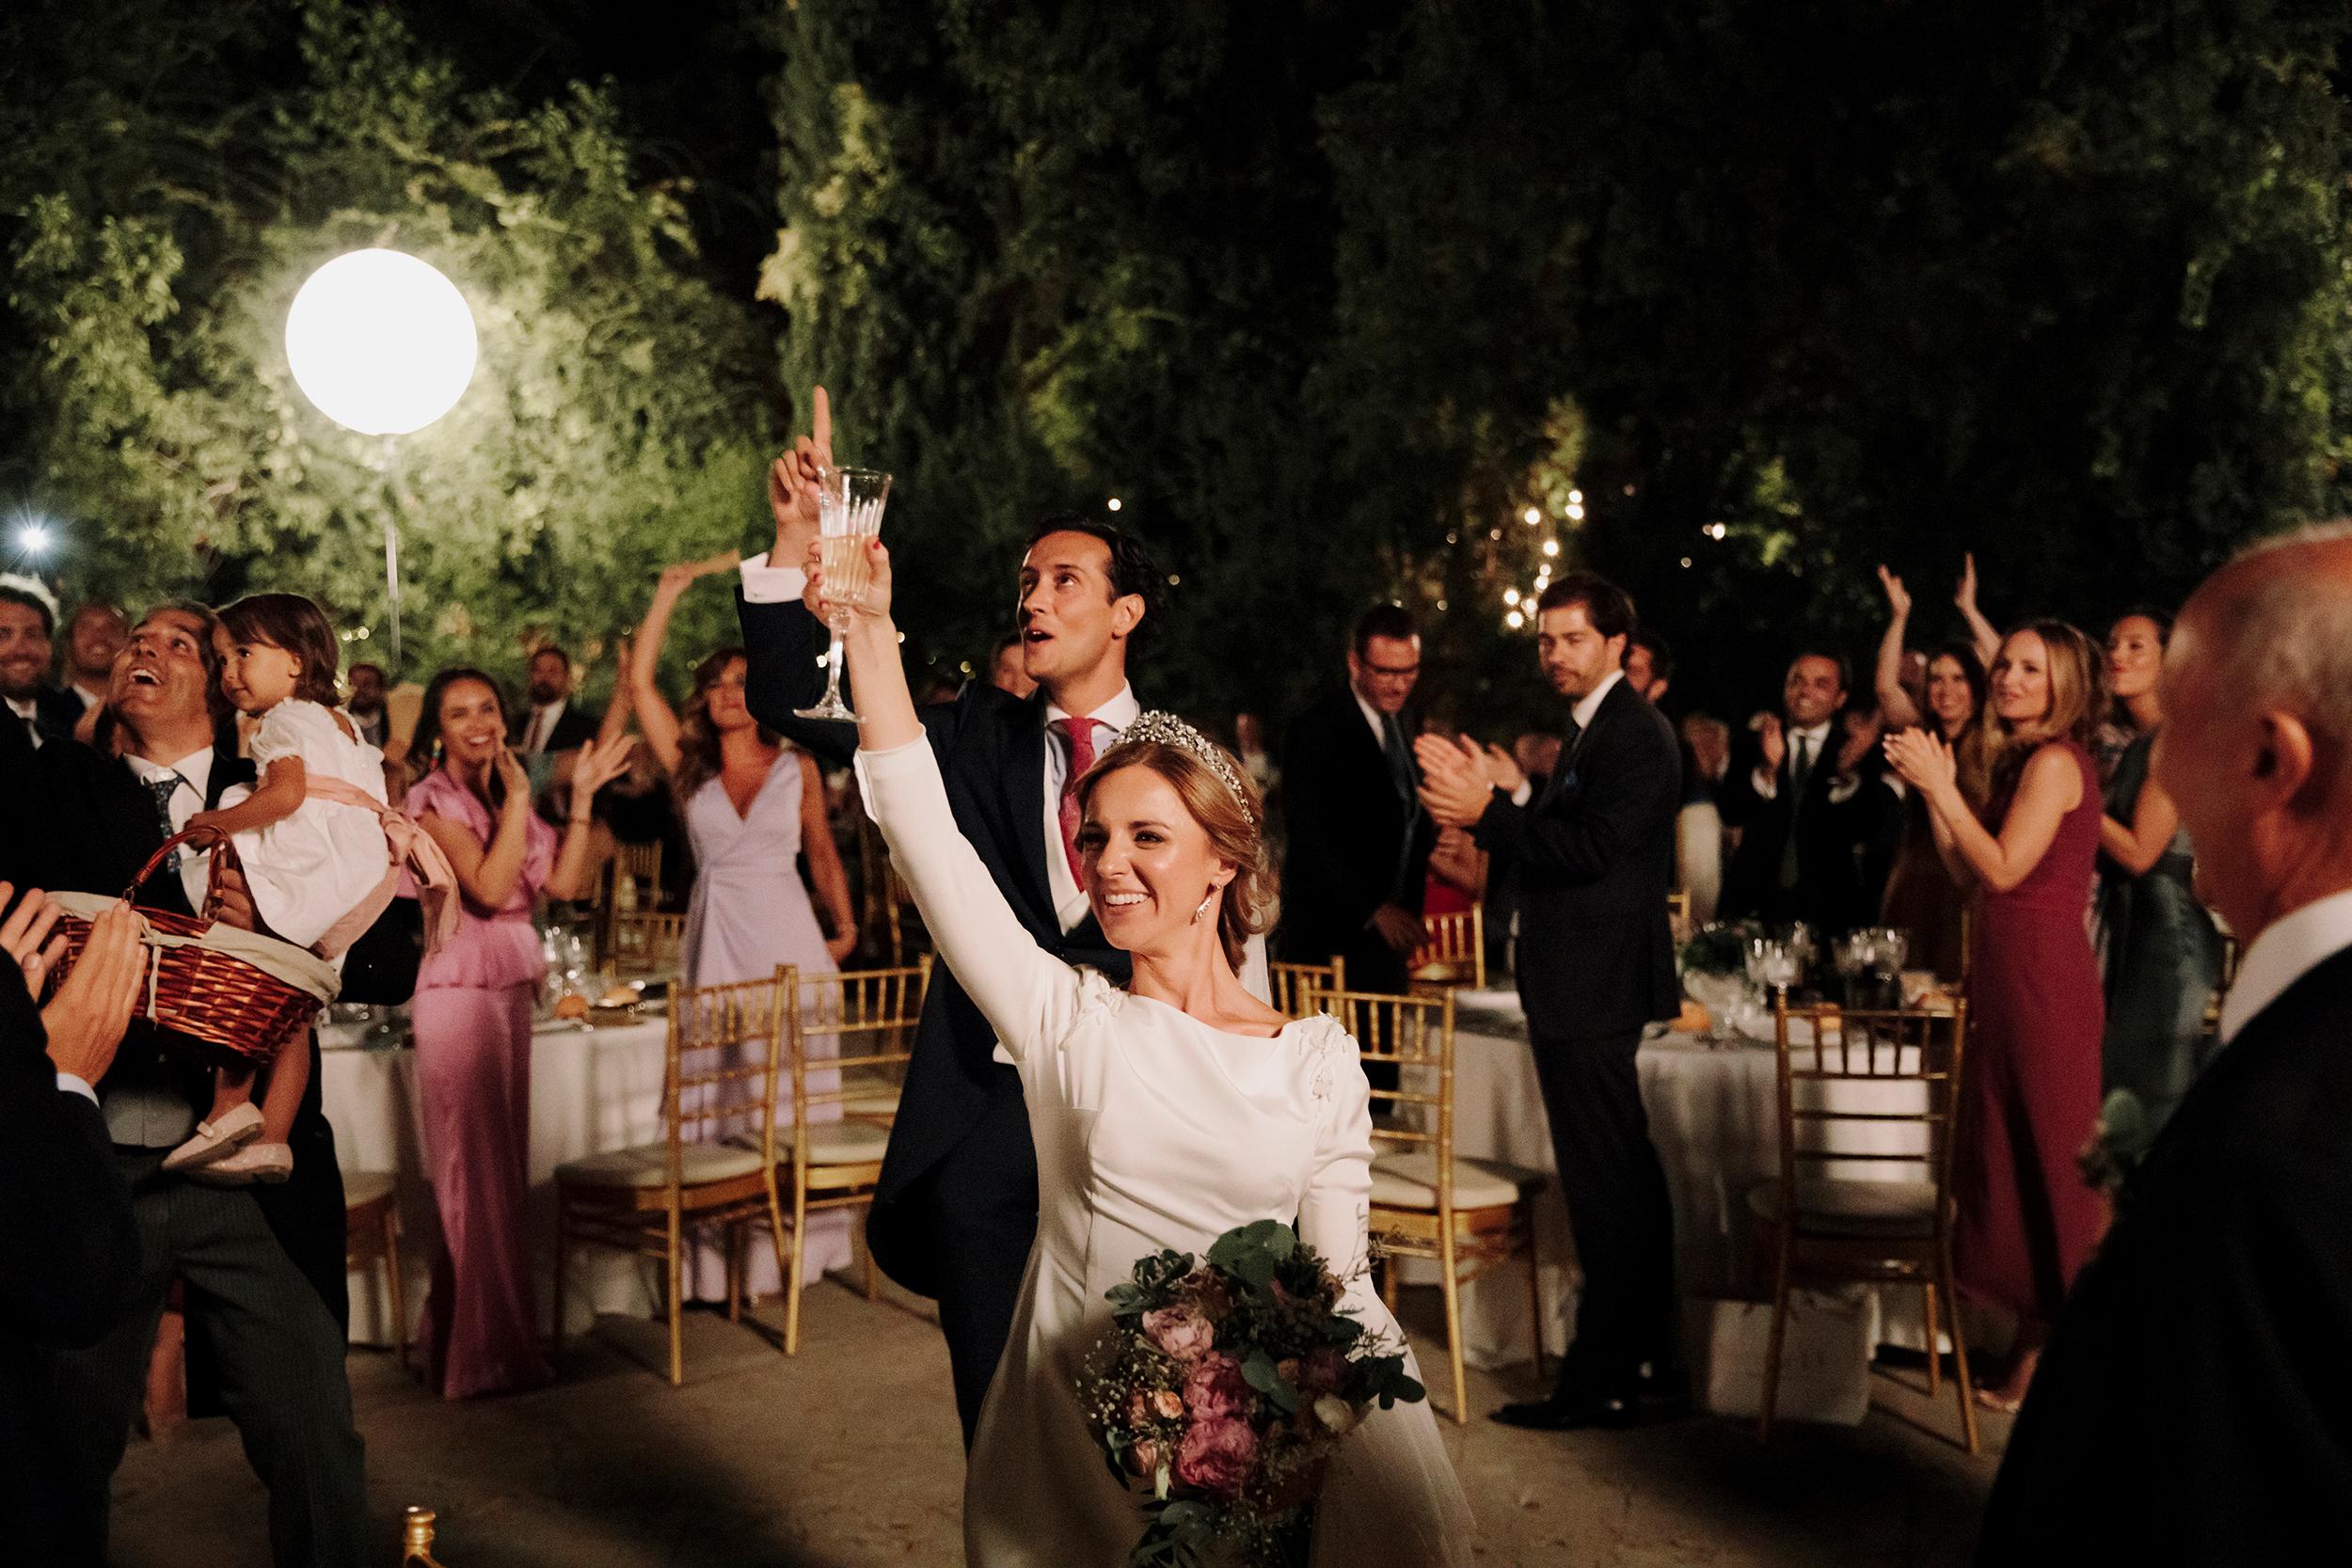 fotografo-bodas-granada-catedral-sagrario-jose-reyes_074.jpg